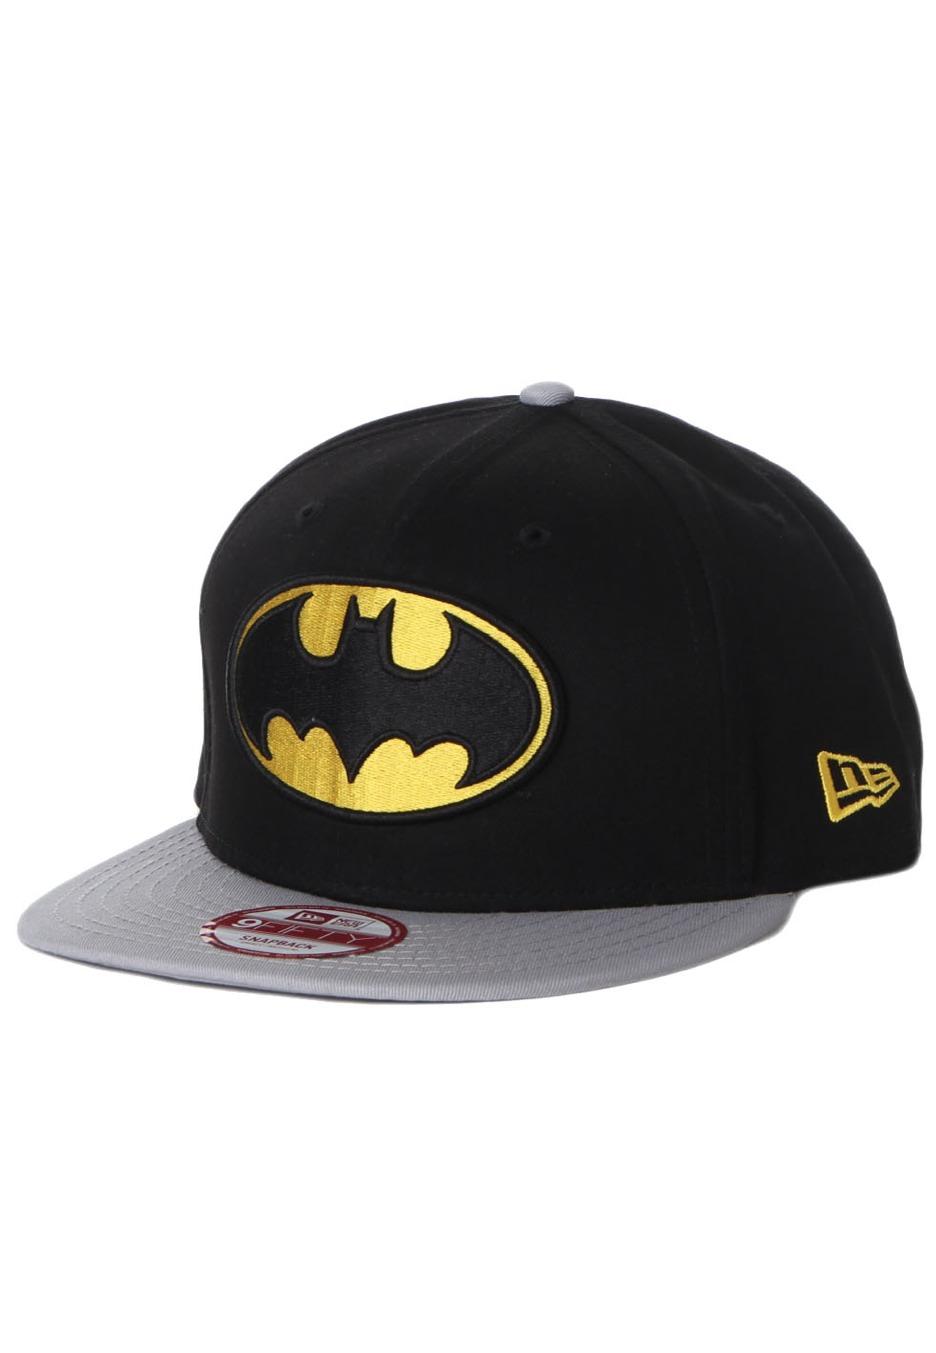 919d58fe00c New Era - Reverse Hero Batman Official Grey Black Yellow Snapback - Cap -  Impericon.com UK